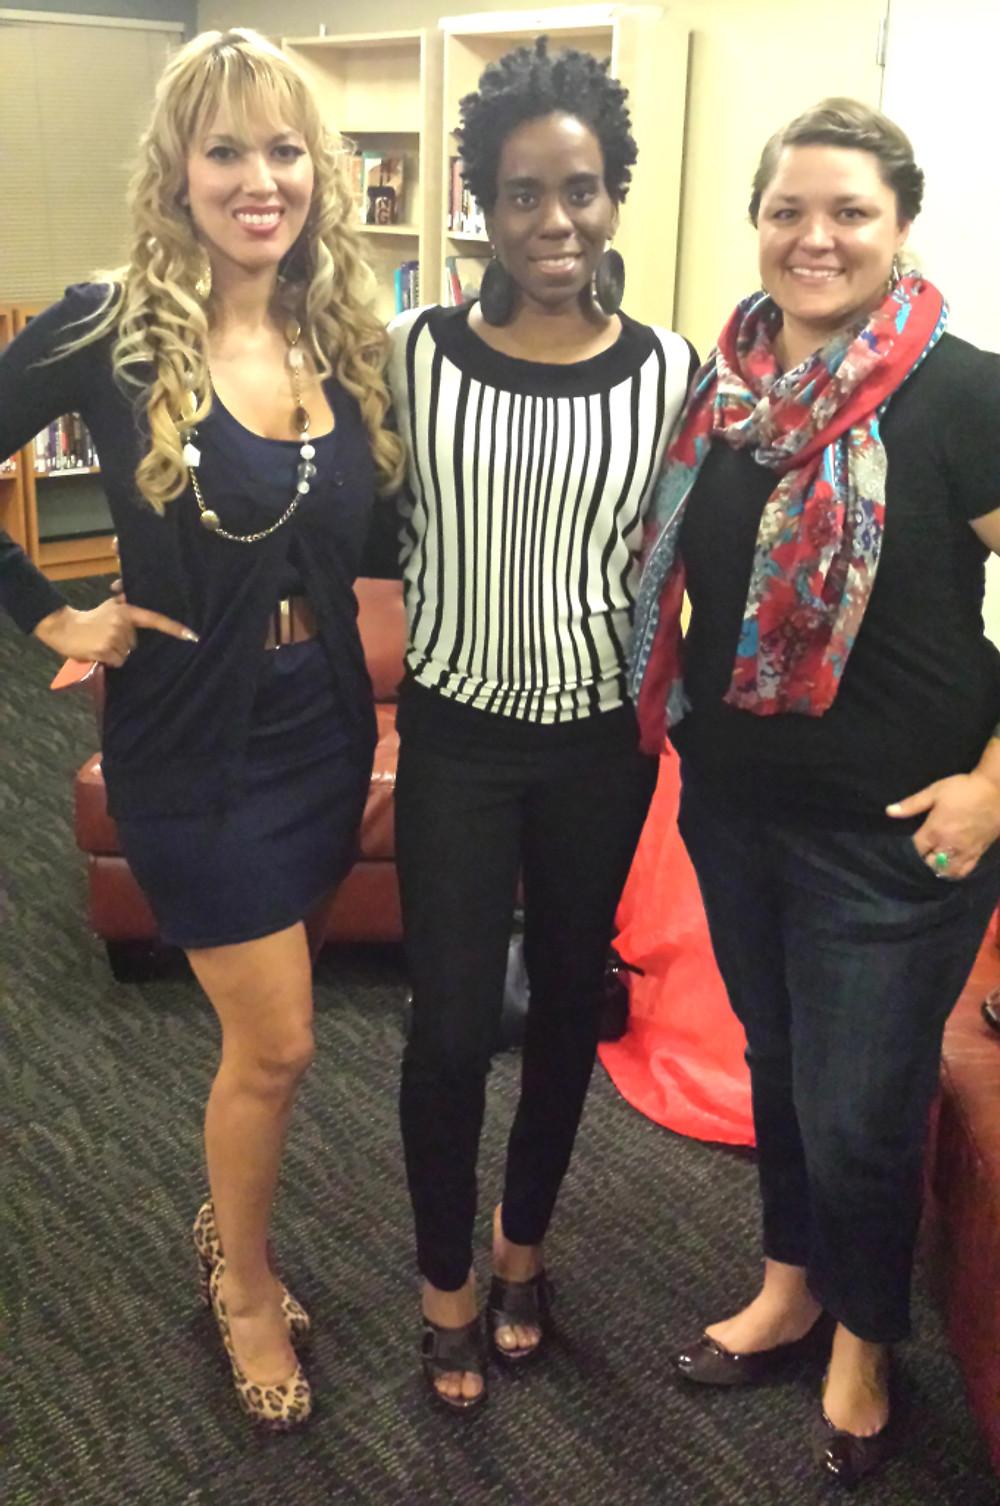 Kristy Salazar, Alyscia Cunningham and Sheena Whitaker